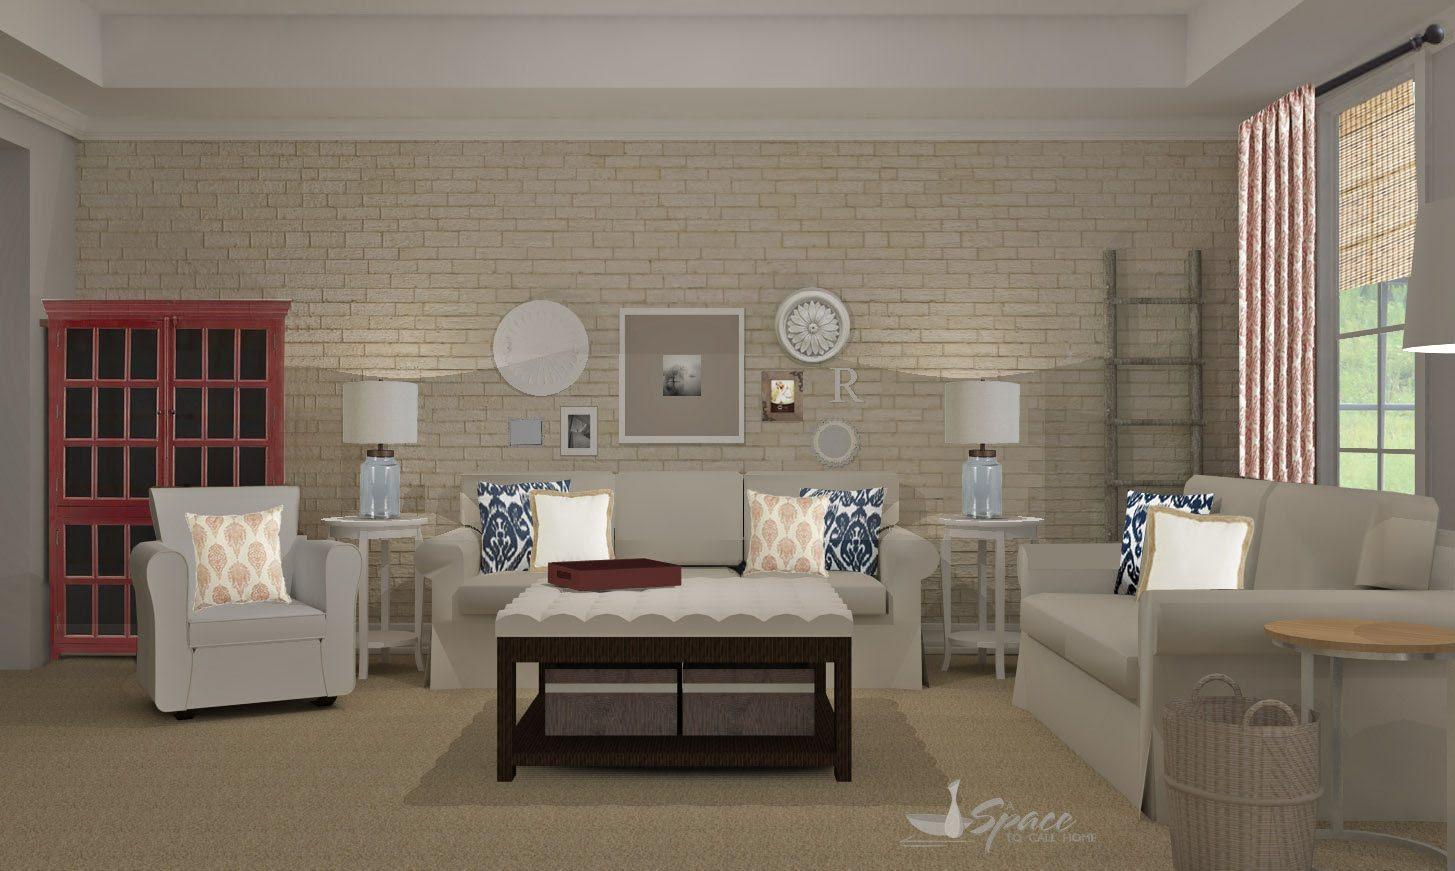 Home design wilmington nc gallery